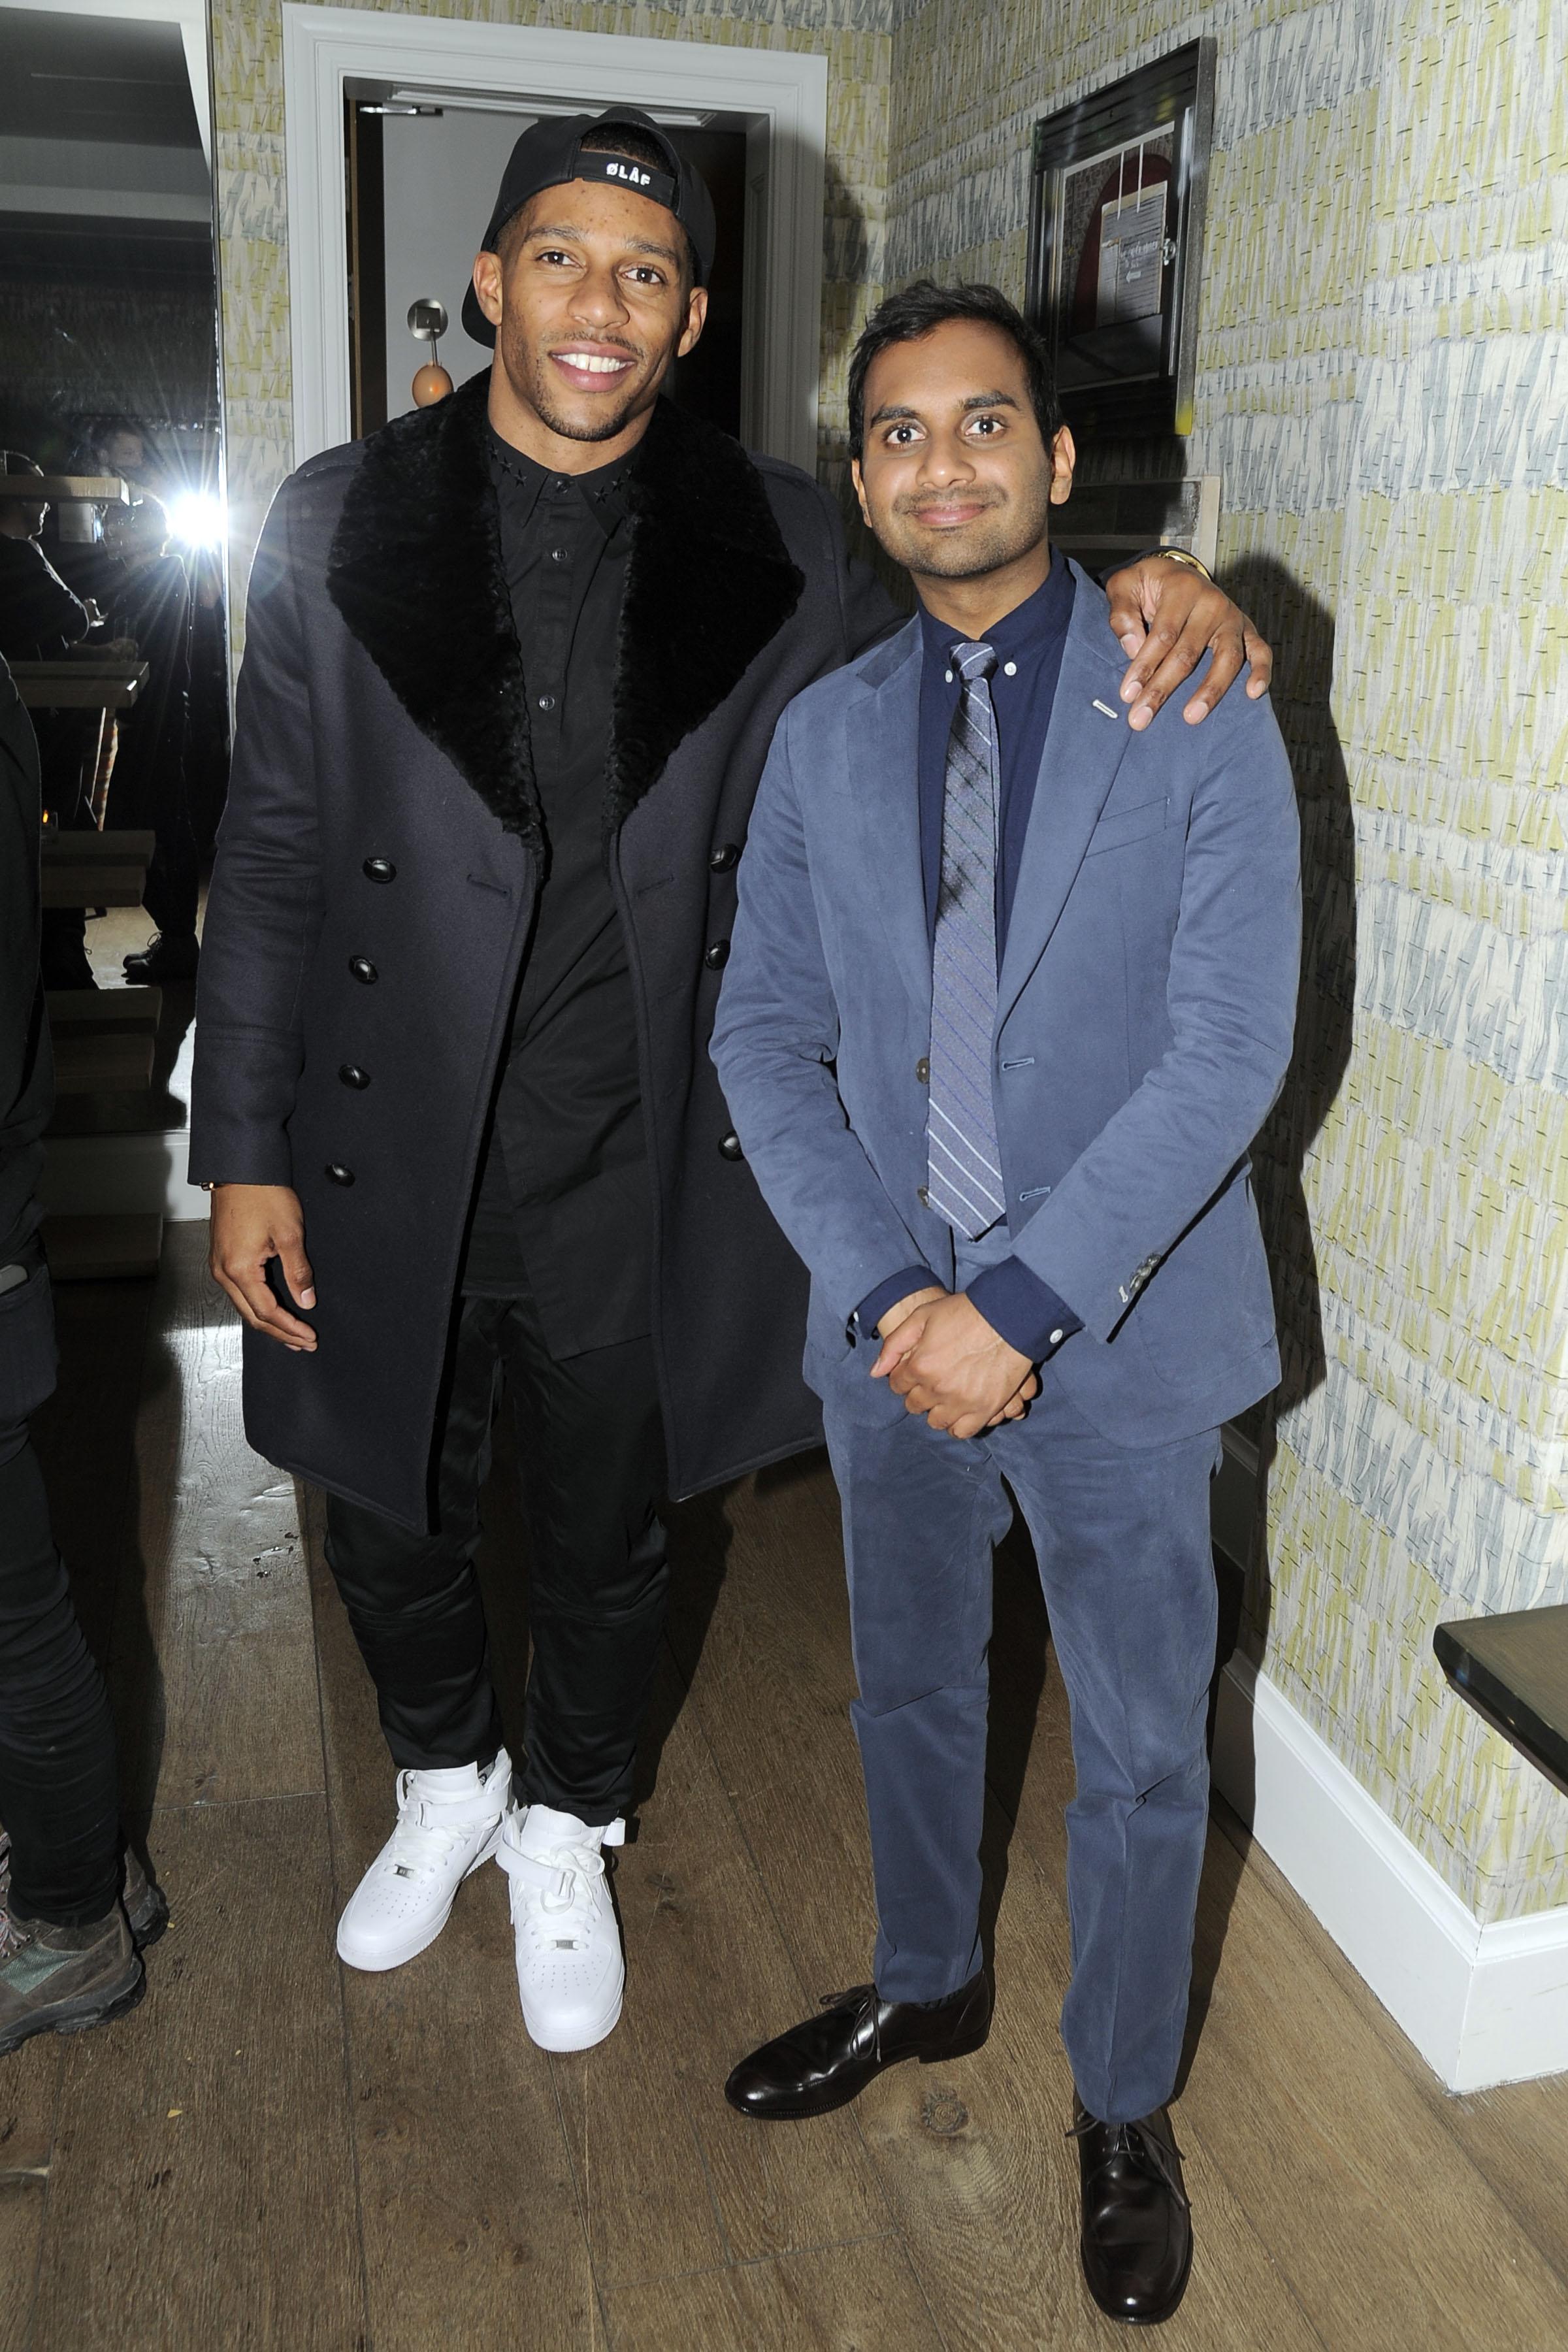 Victor Cruz and Aziz Ansari at the latter's Netflix premiere (Photo: Patrick McMullan).